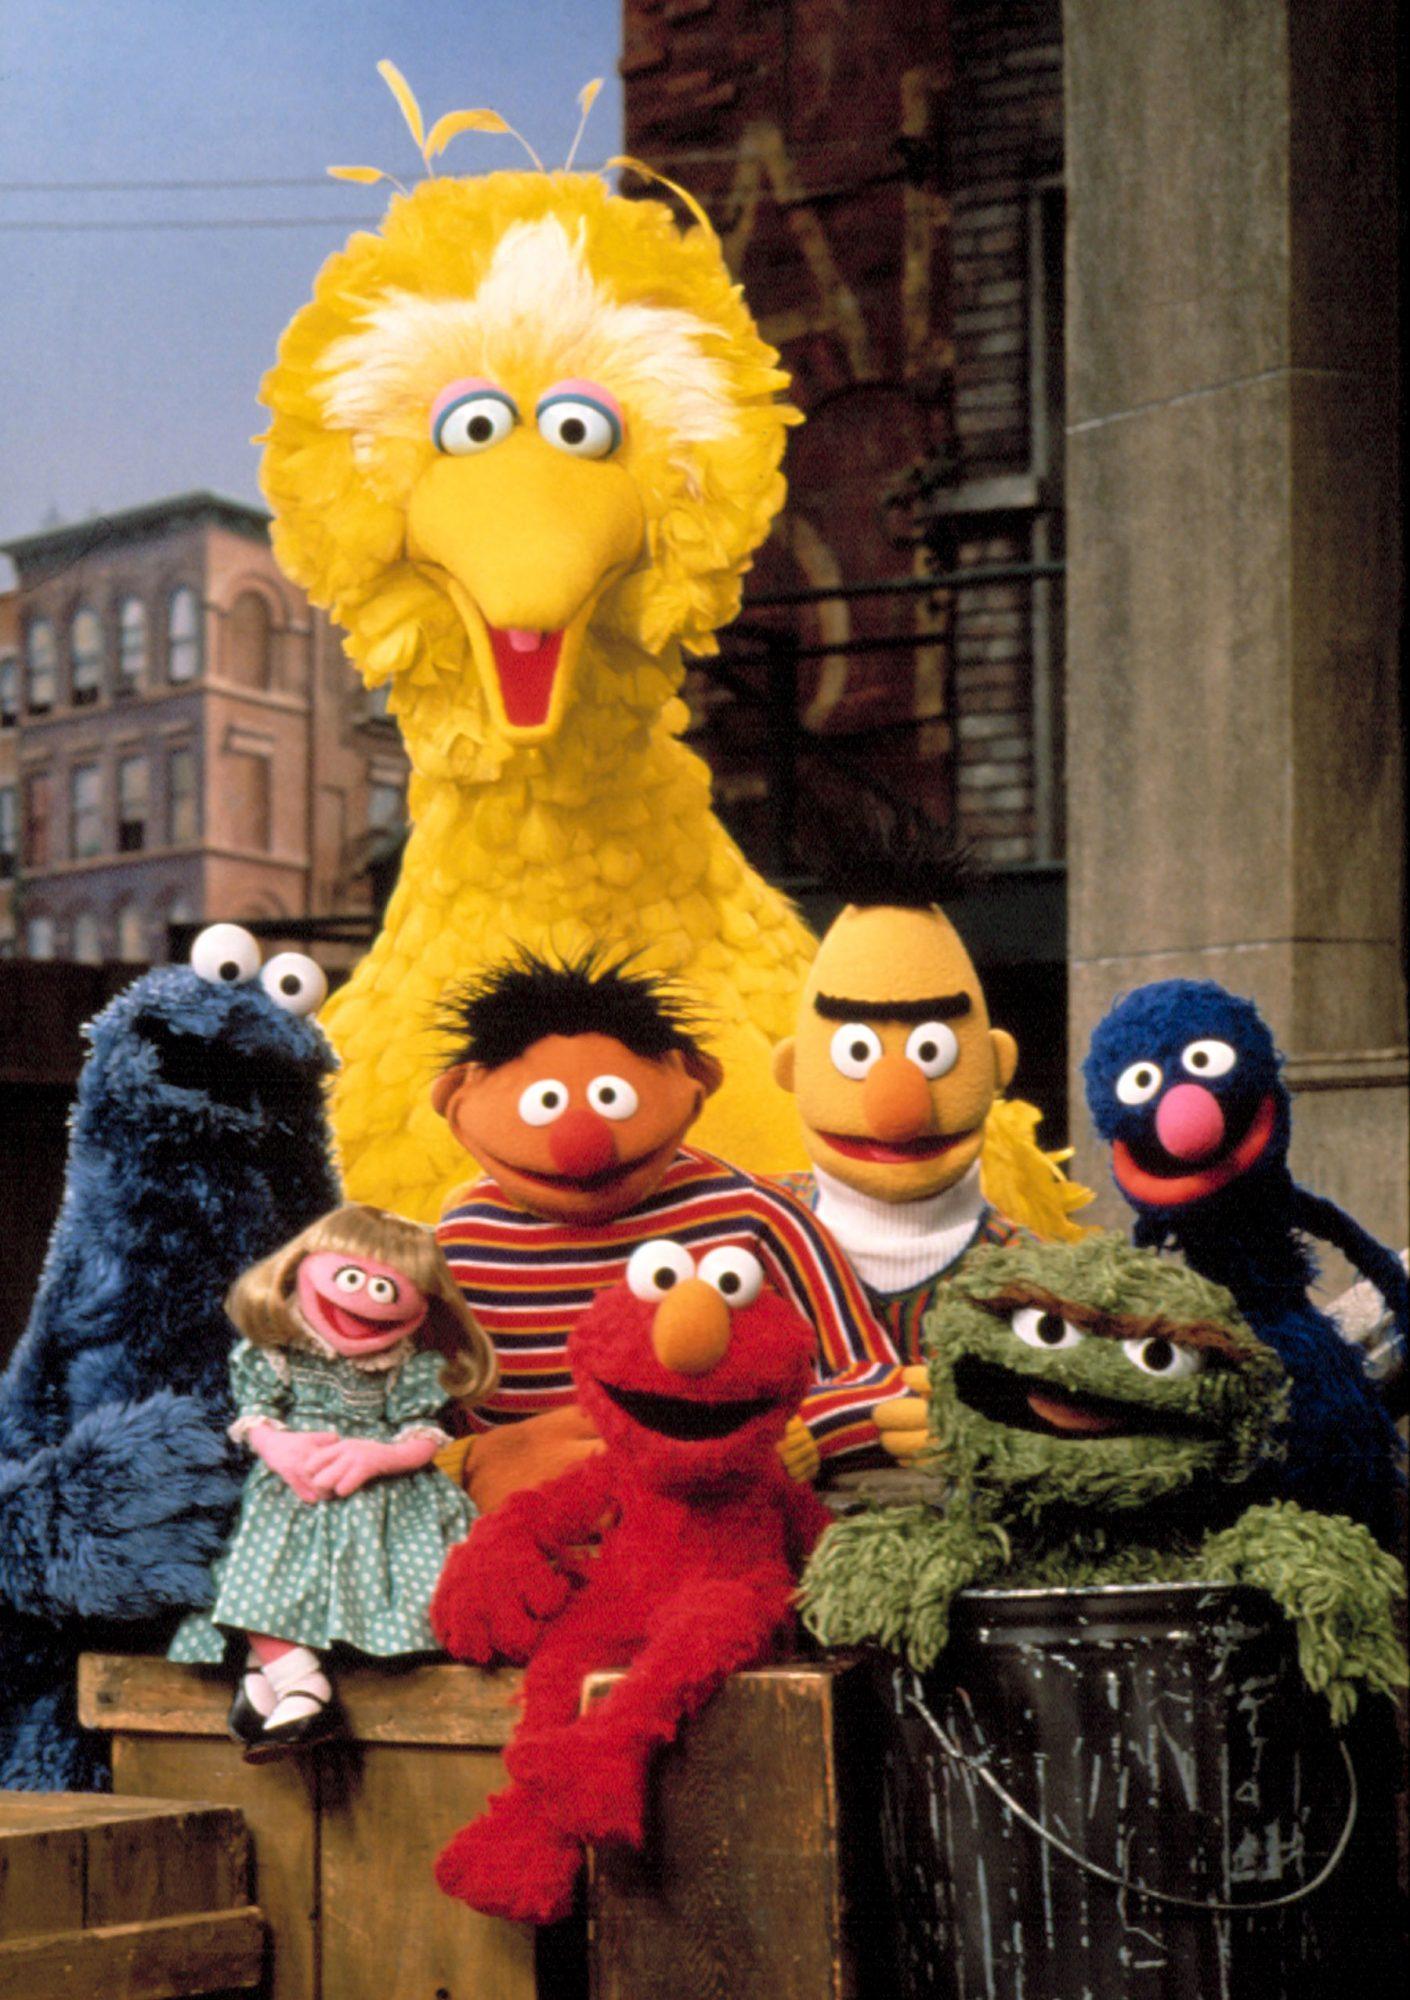 SESAME STREET, (L-R), Cookie Monster, Prairie Dawn, Big Bird, Ernie, Elmo, Bert, Oscar the Grouch, G